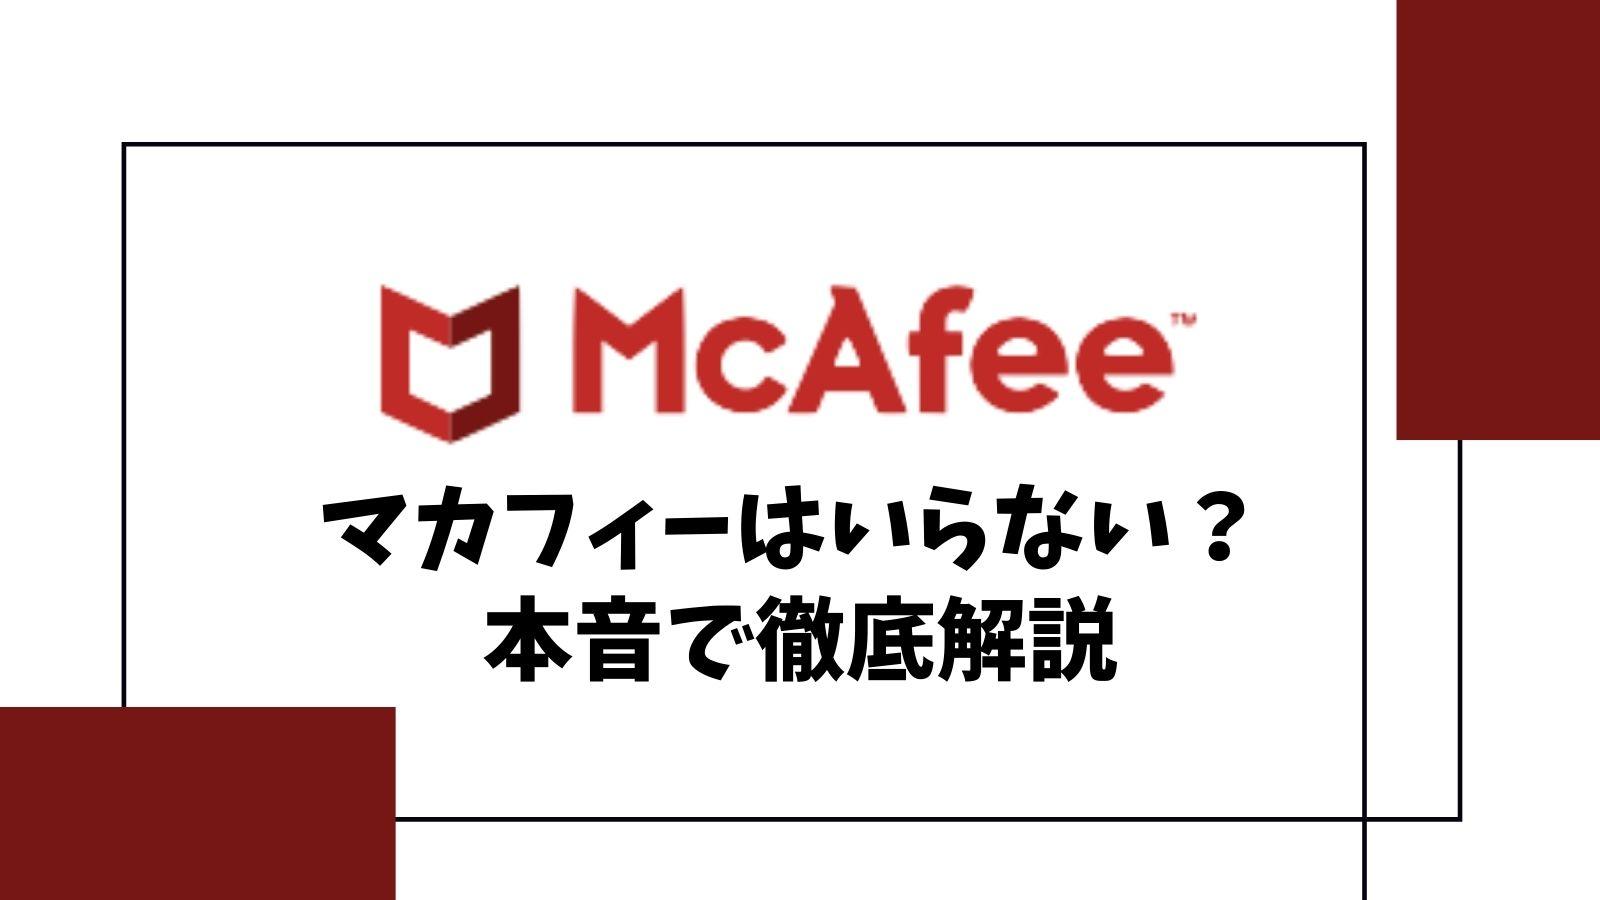 Mcafee(マカフィー)はいらない?検証結果や削除方法を徹底解説!